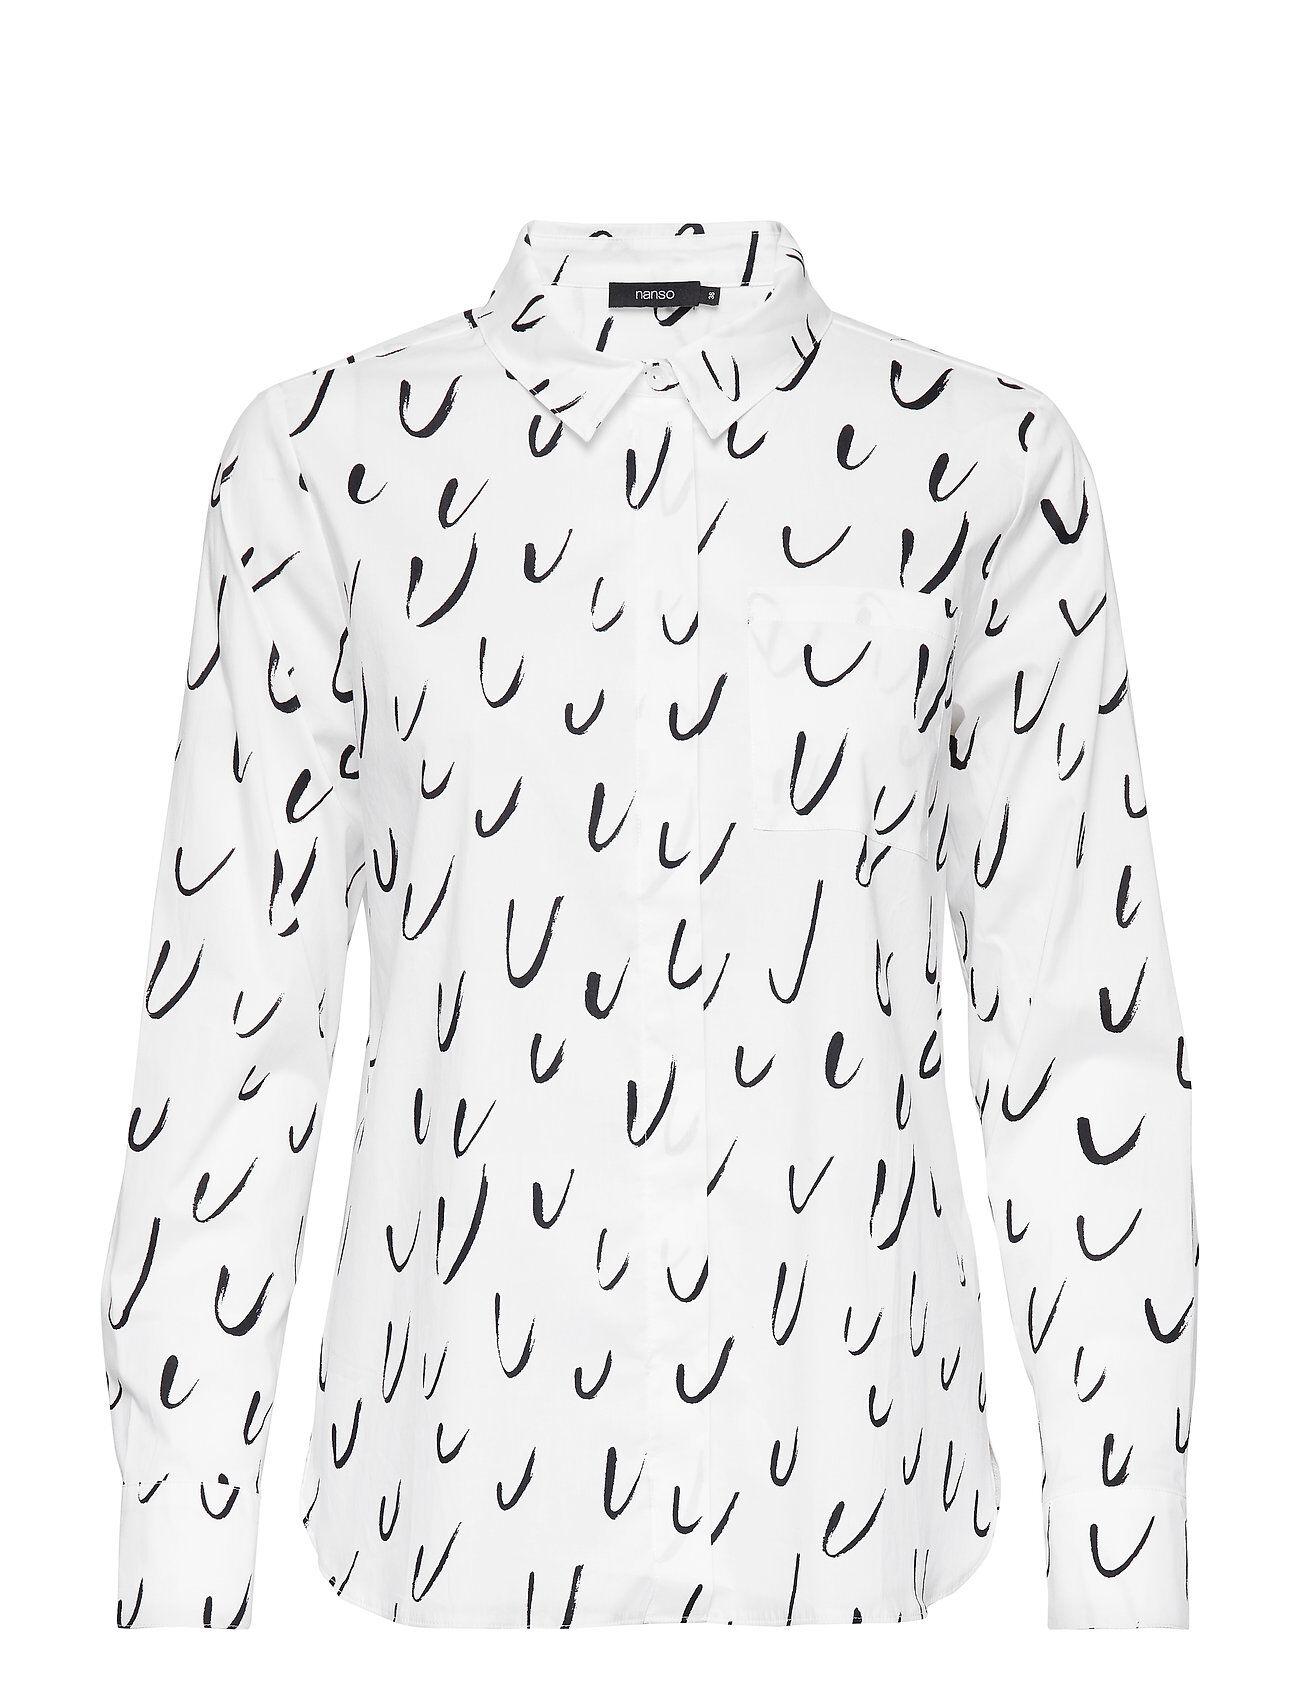 Nanso Ladies Shirt, Uu